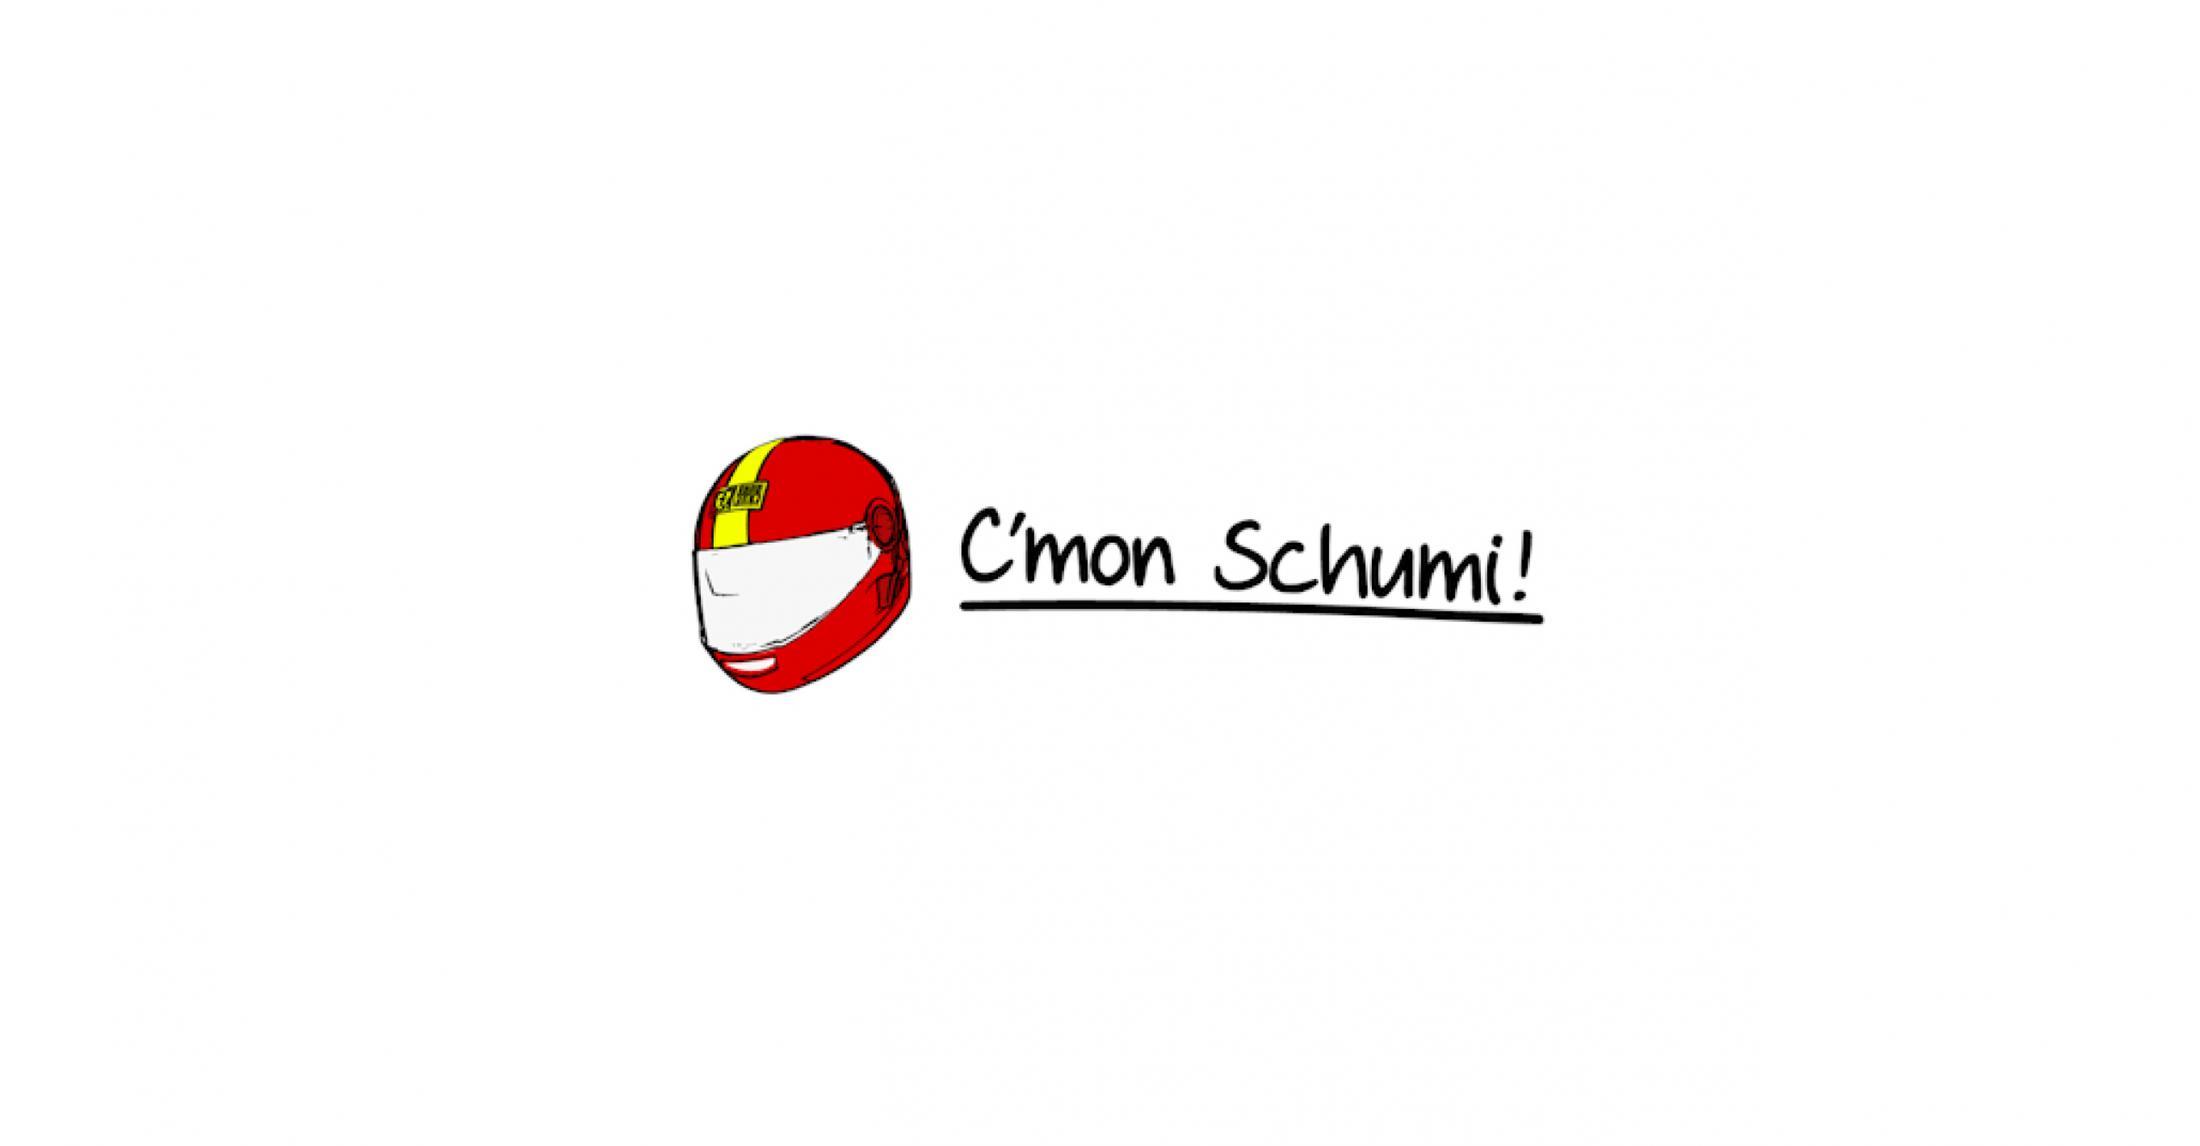 Thumbnail for C'mon Schumi!